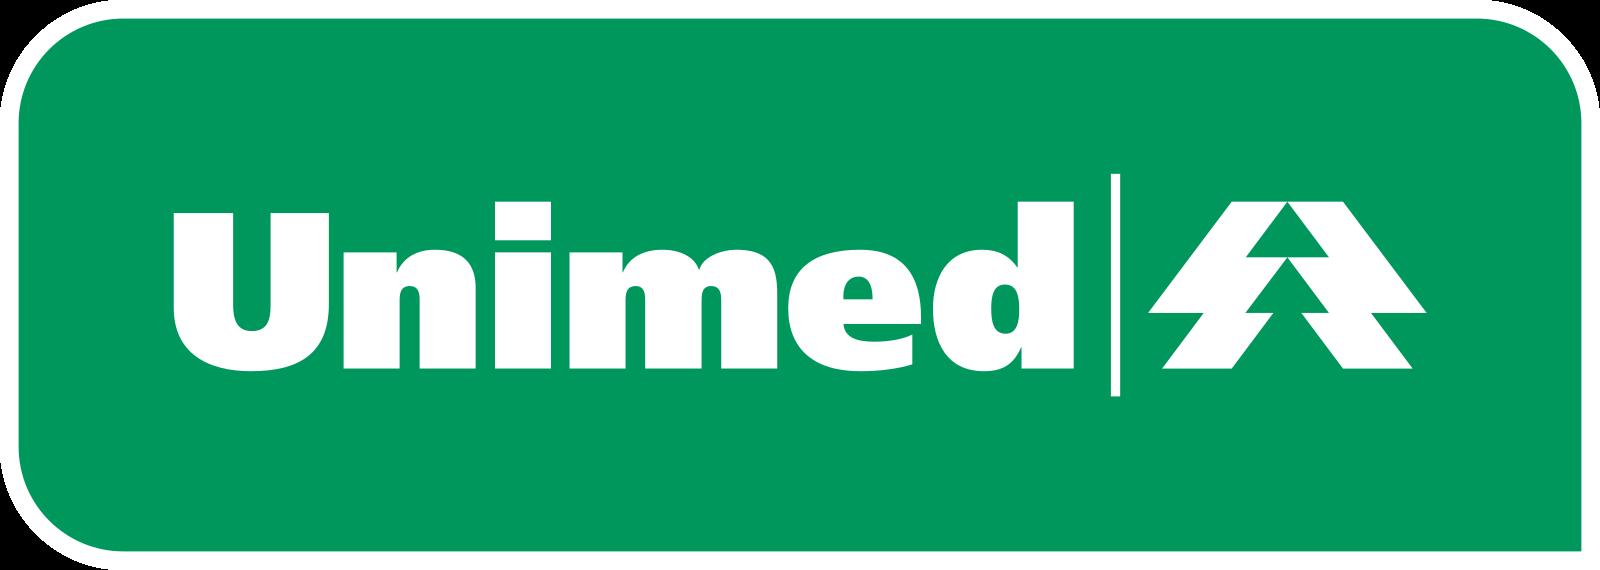 unimed logo 4 - Unimed Logo